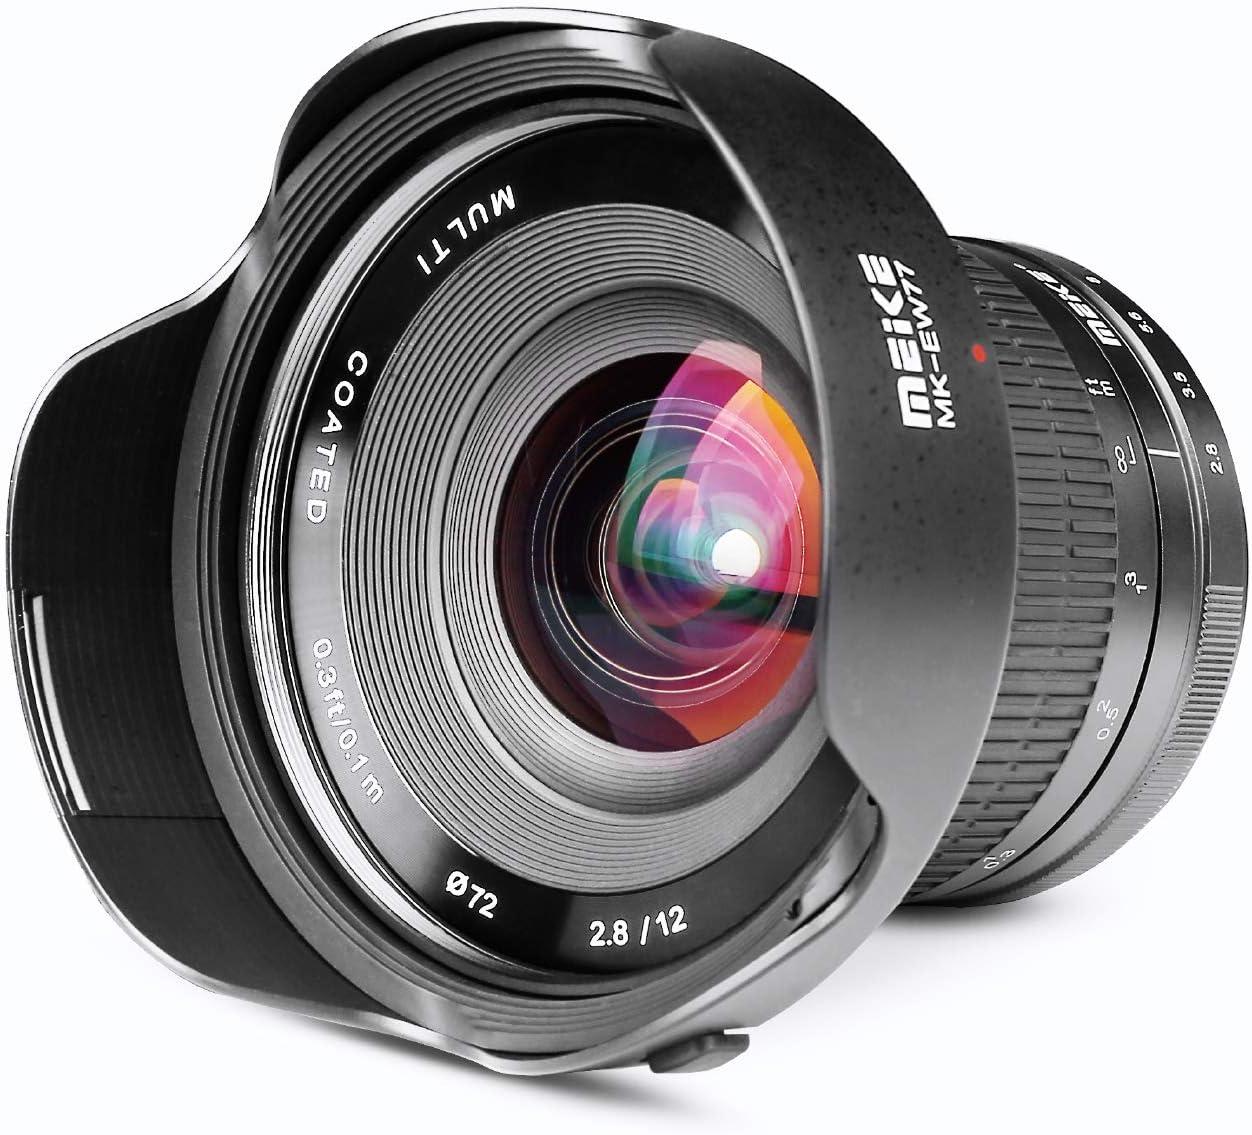 Meike Optics Mk 12mm F2 8 Ultra Weitwinkel Objektiv Für Kamera